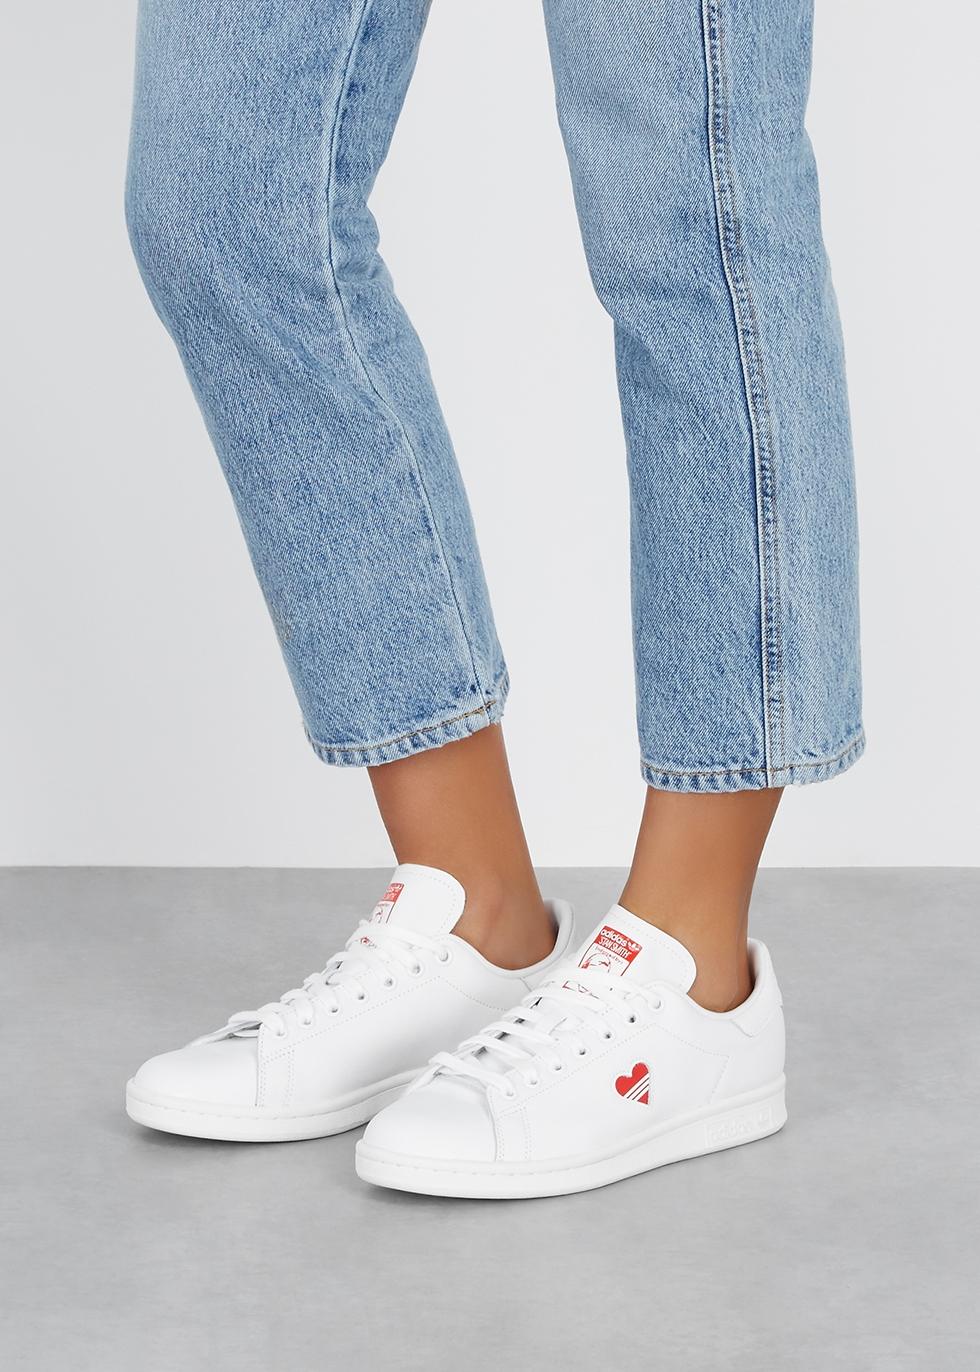 7323d336feee61 Adidas Originals trainers - Designer Sneakers - Harvey Nichols